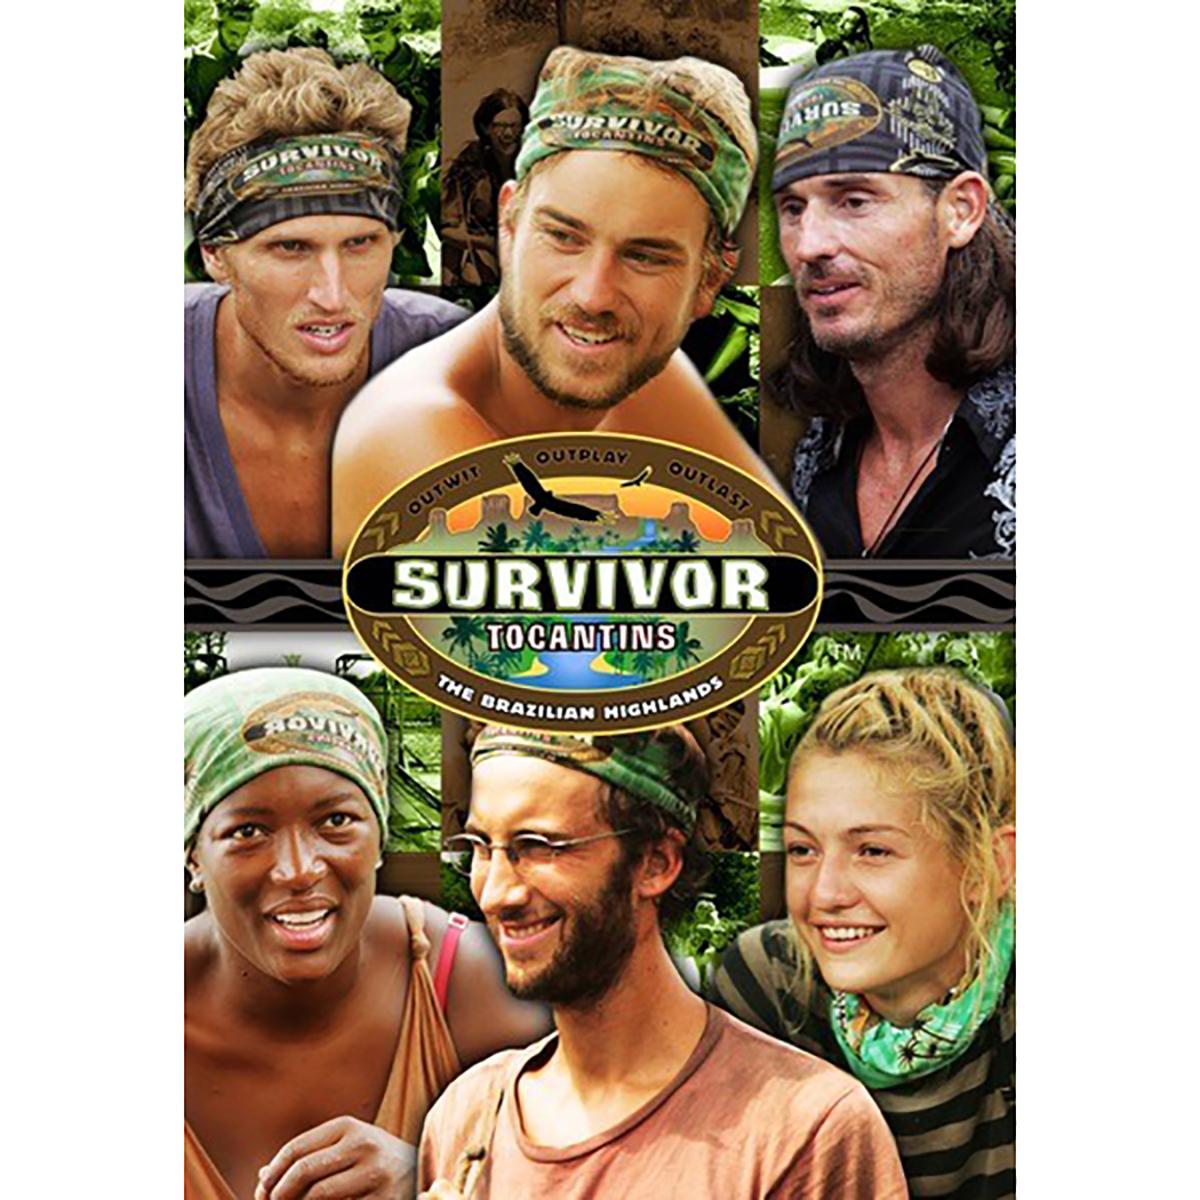 Survivor: Season 18 - Tocantins DVD